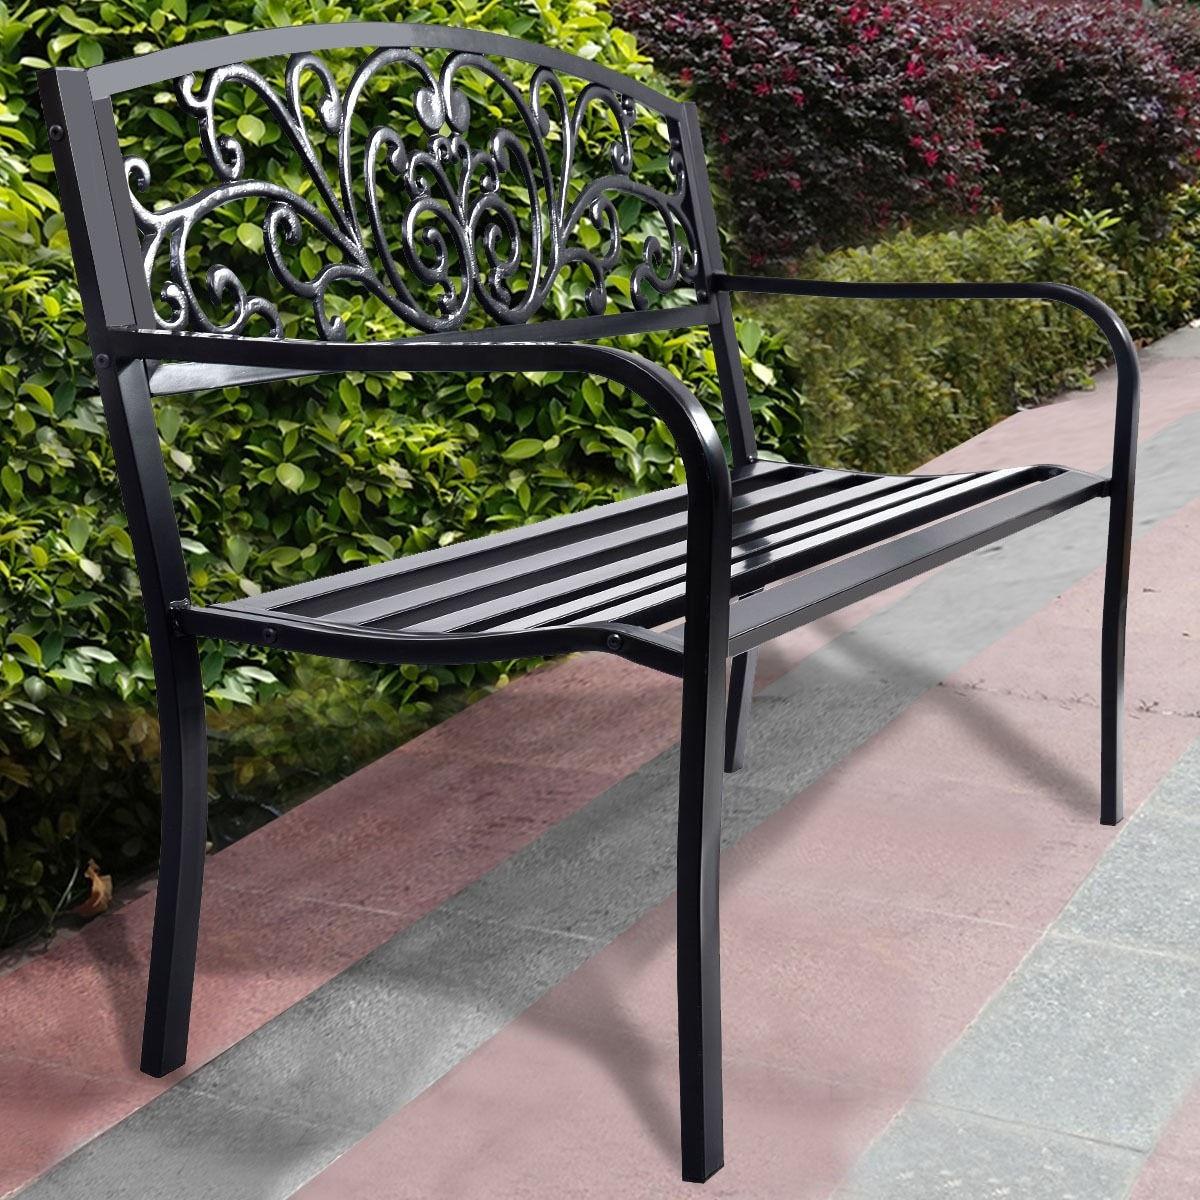 50 Black Patio Park Garden Steel Frame Bench Mesh Style Cast Iron Backrest Outdoor Backyard Furniture Op2786 Aliexpress